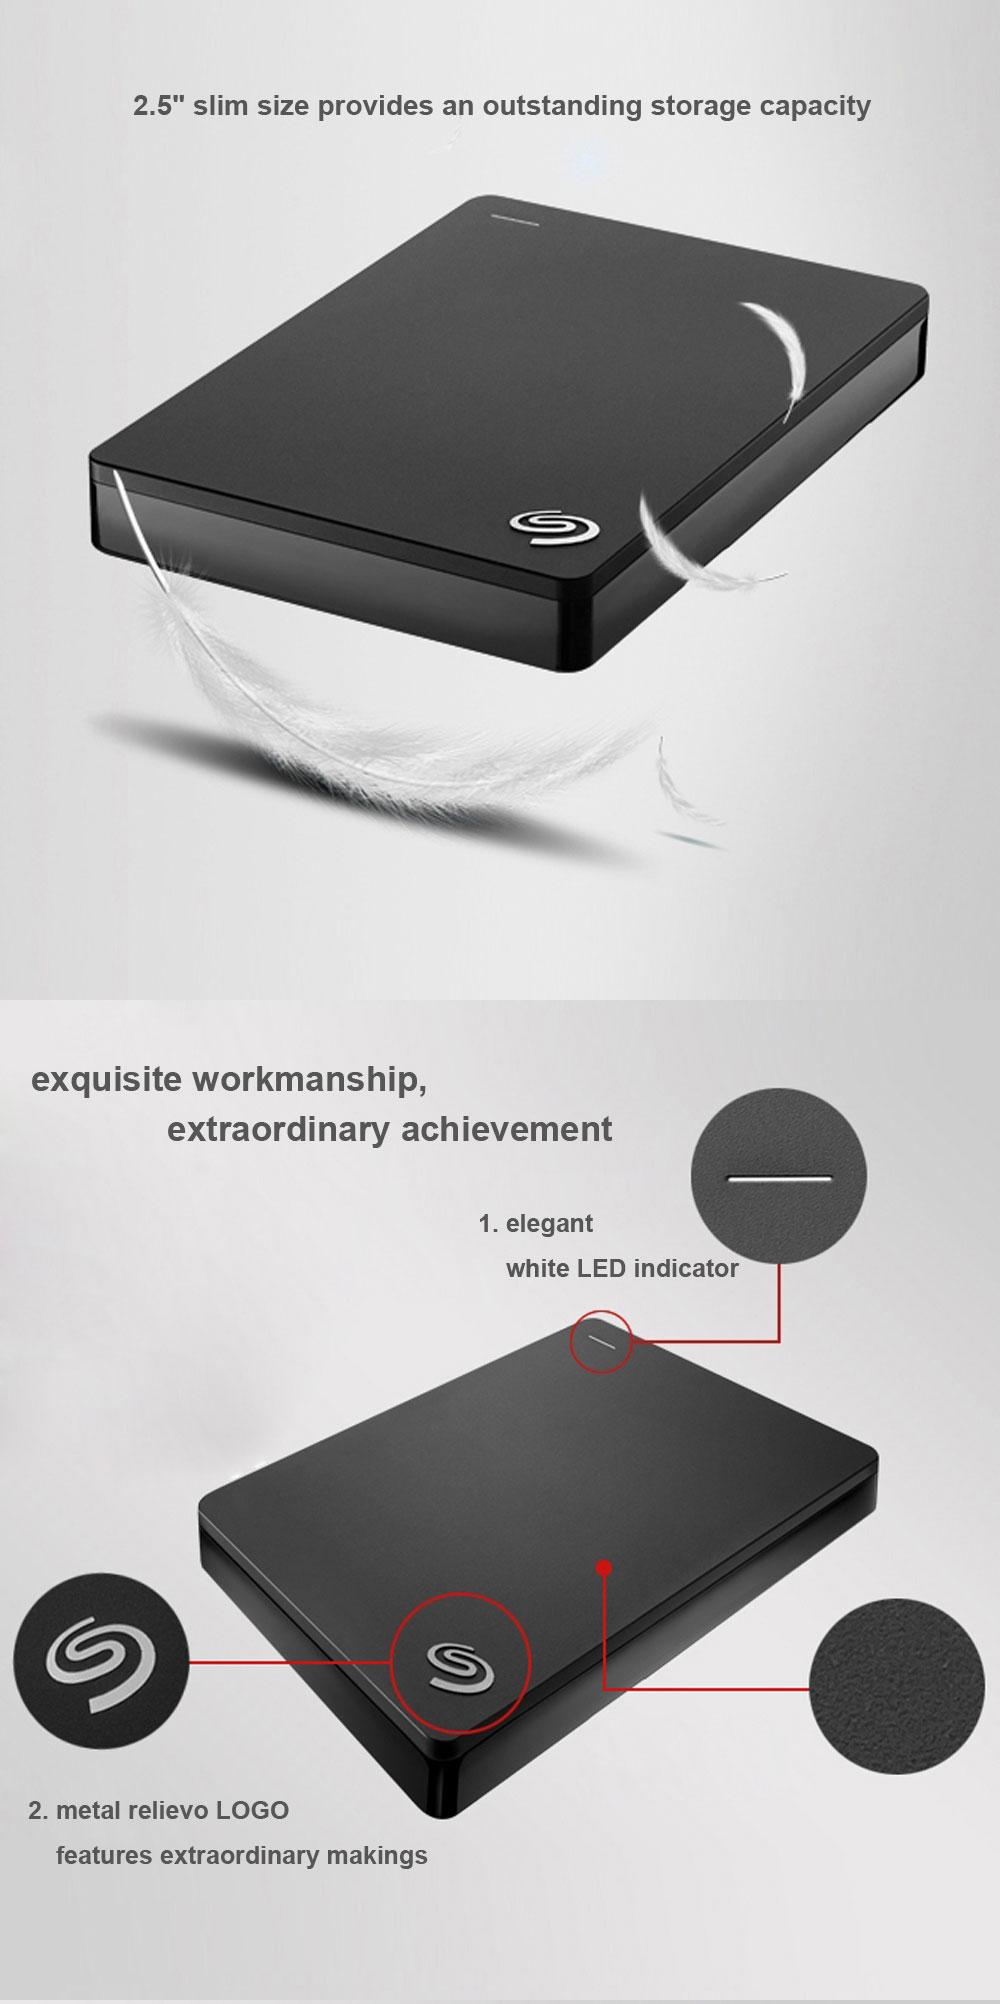 Seagate-External-HDD-Disk-1TB_01